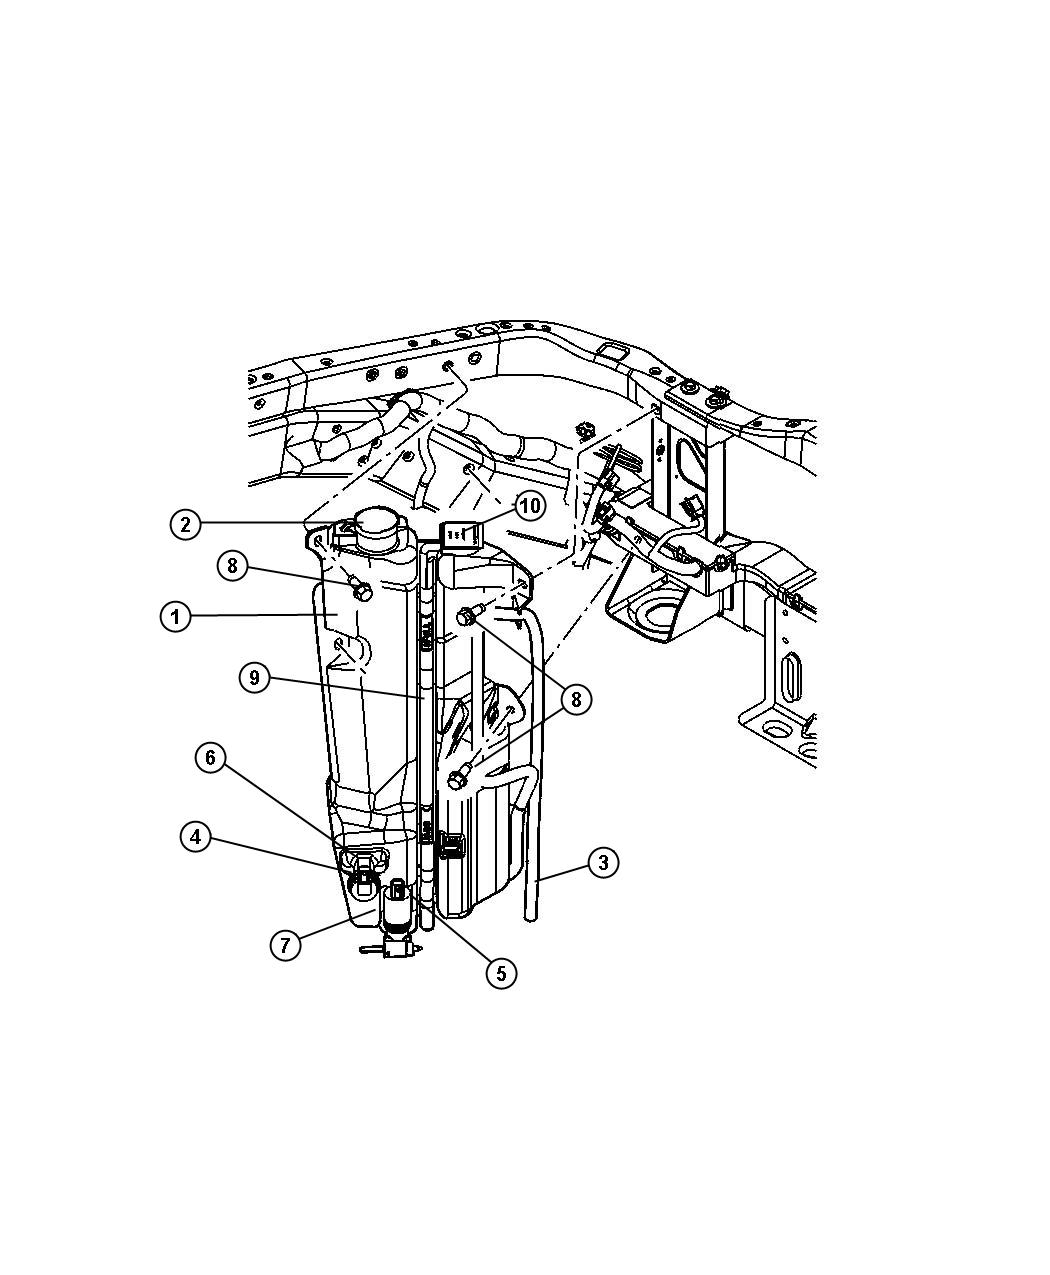 Jeep Liberty Sensor Washer Fluid Level